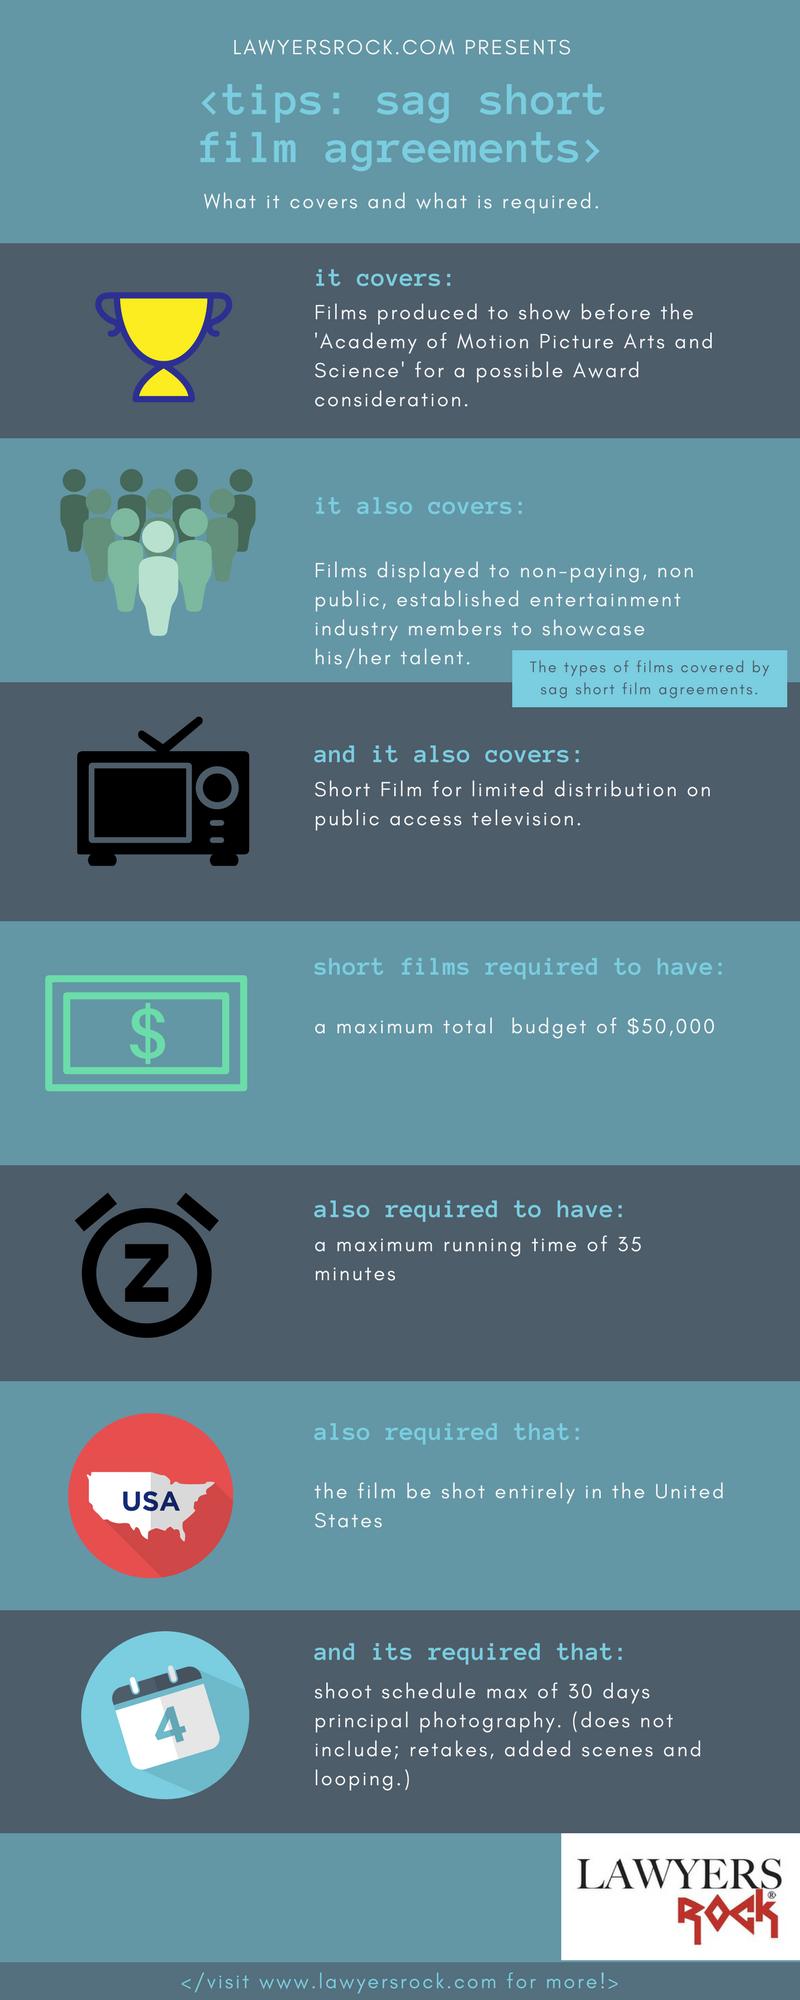 sag short film agreements